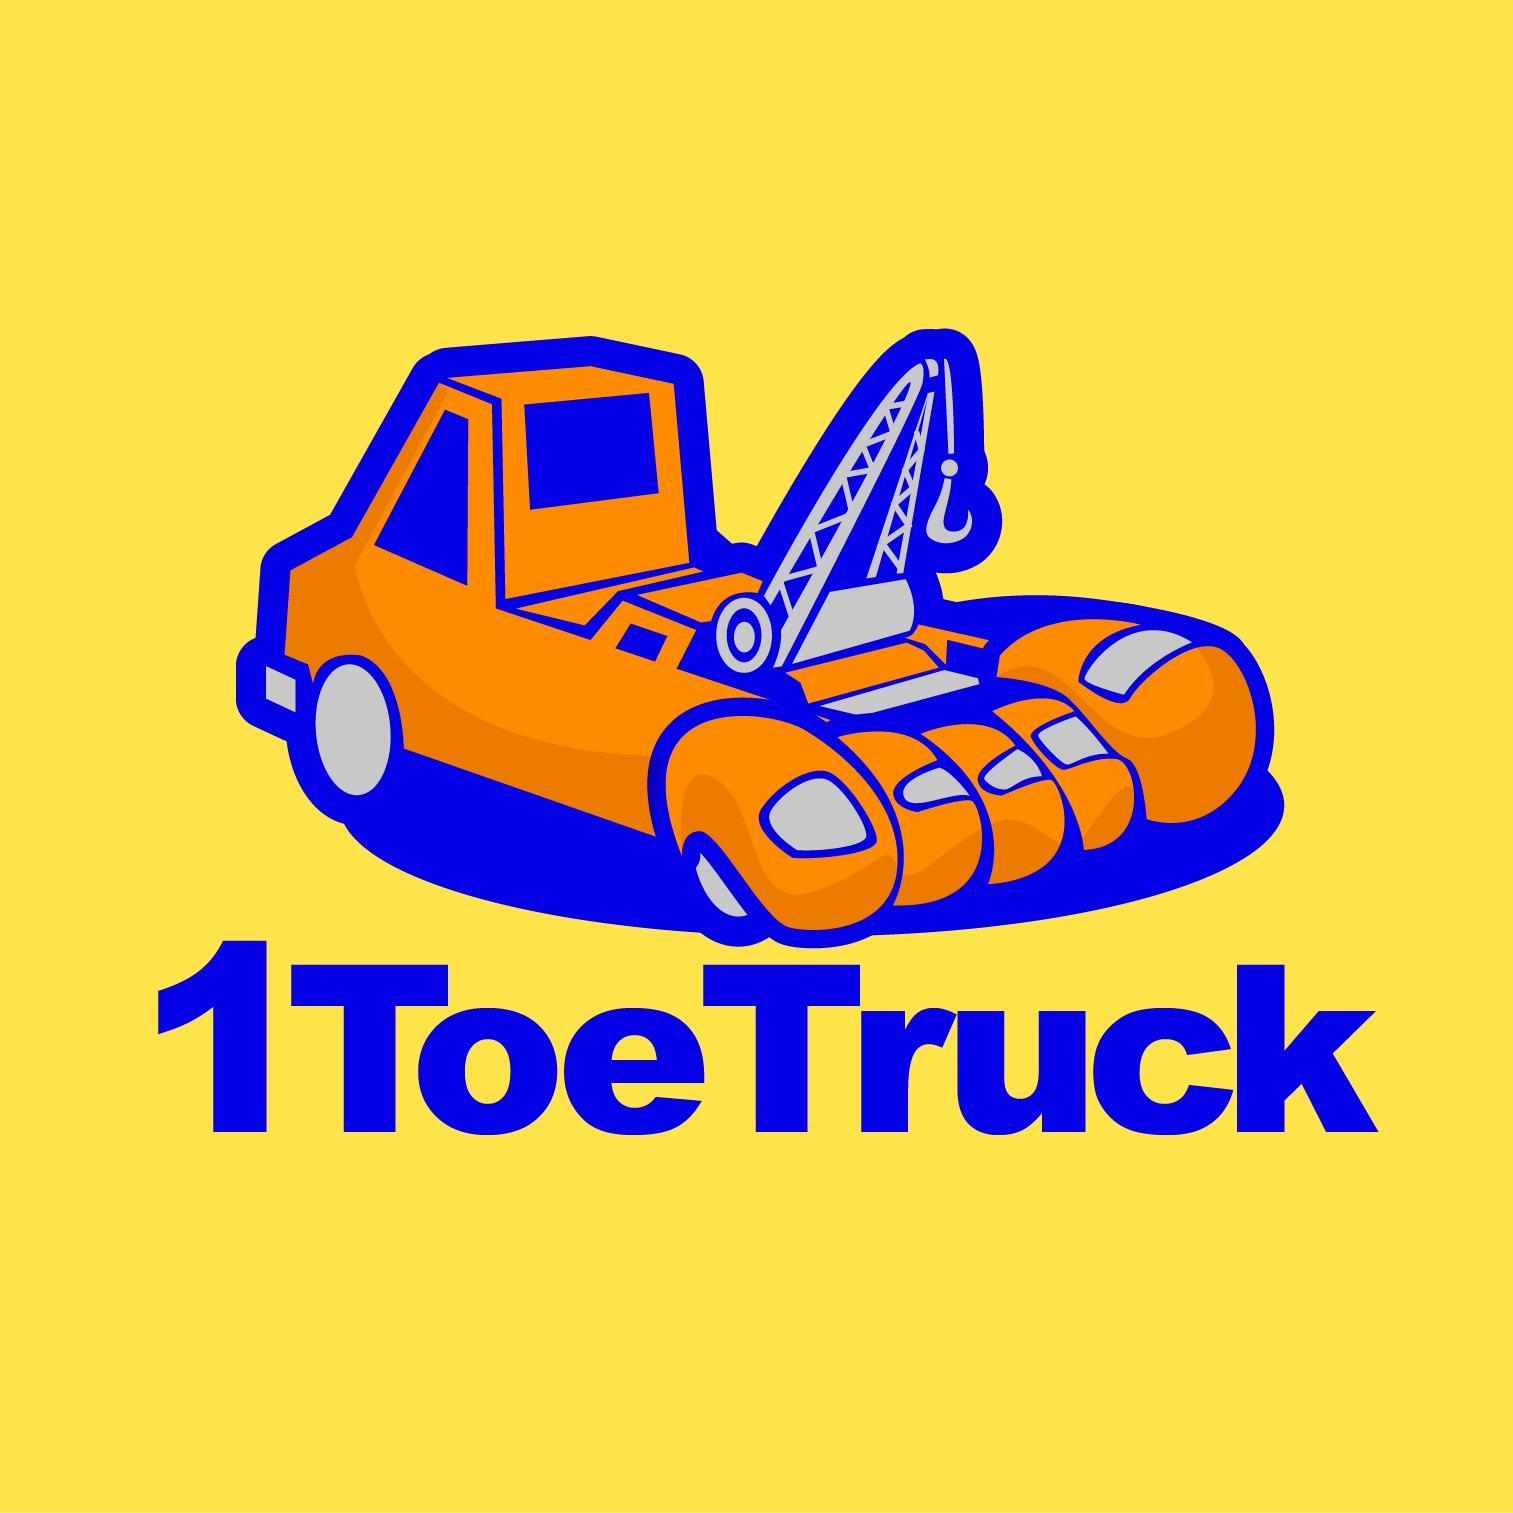 1 Toe Truck, LLC